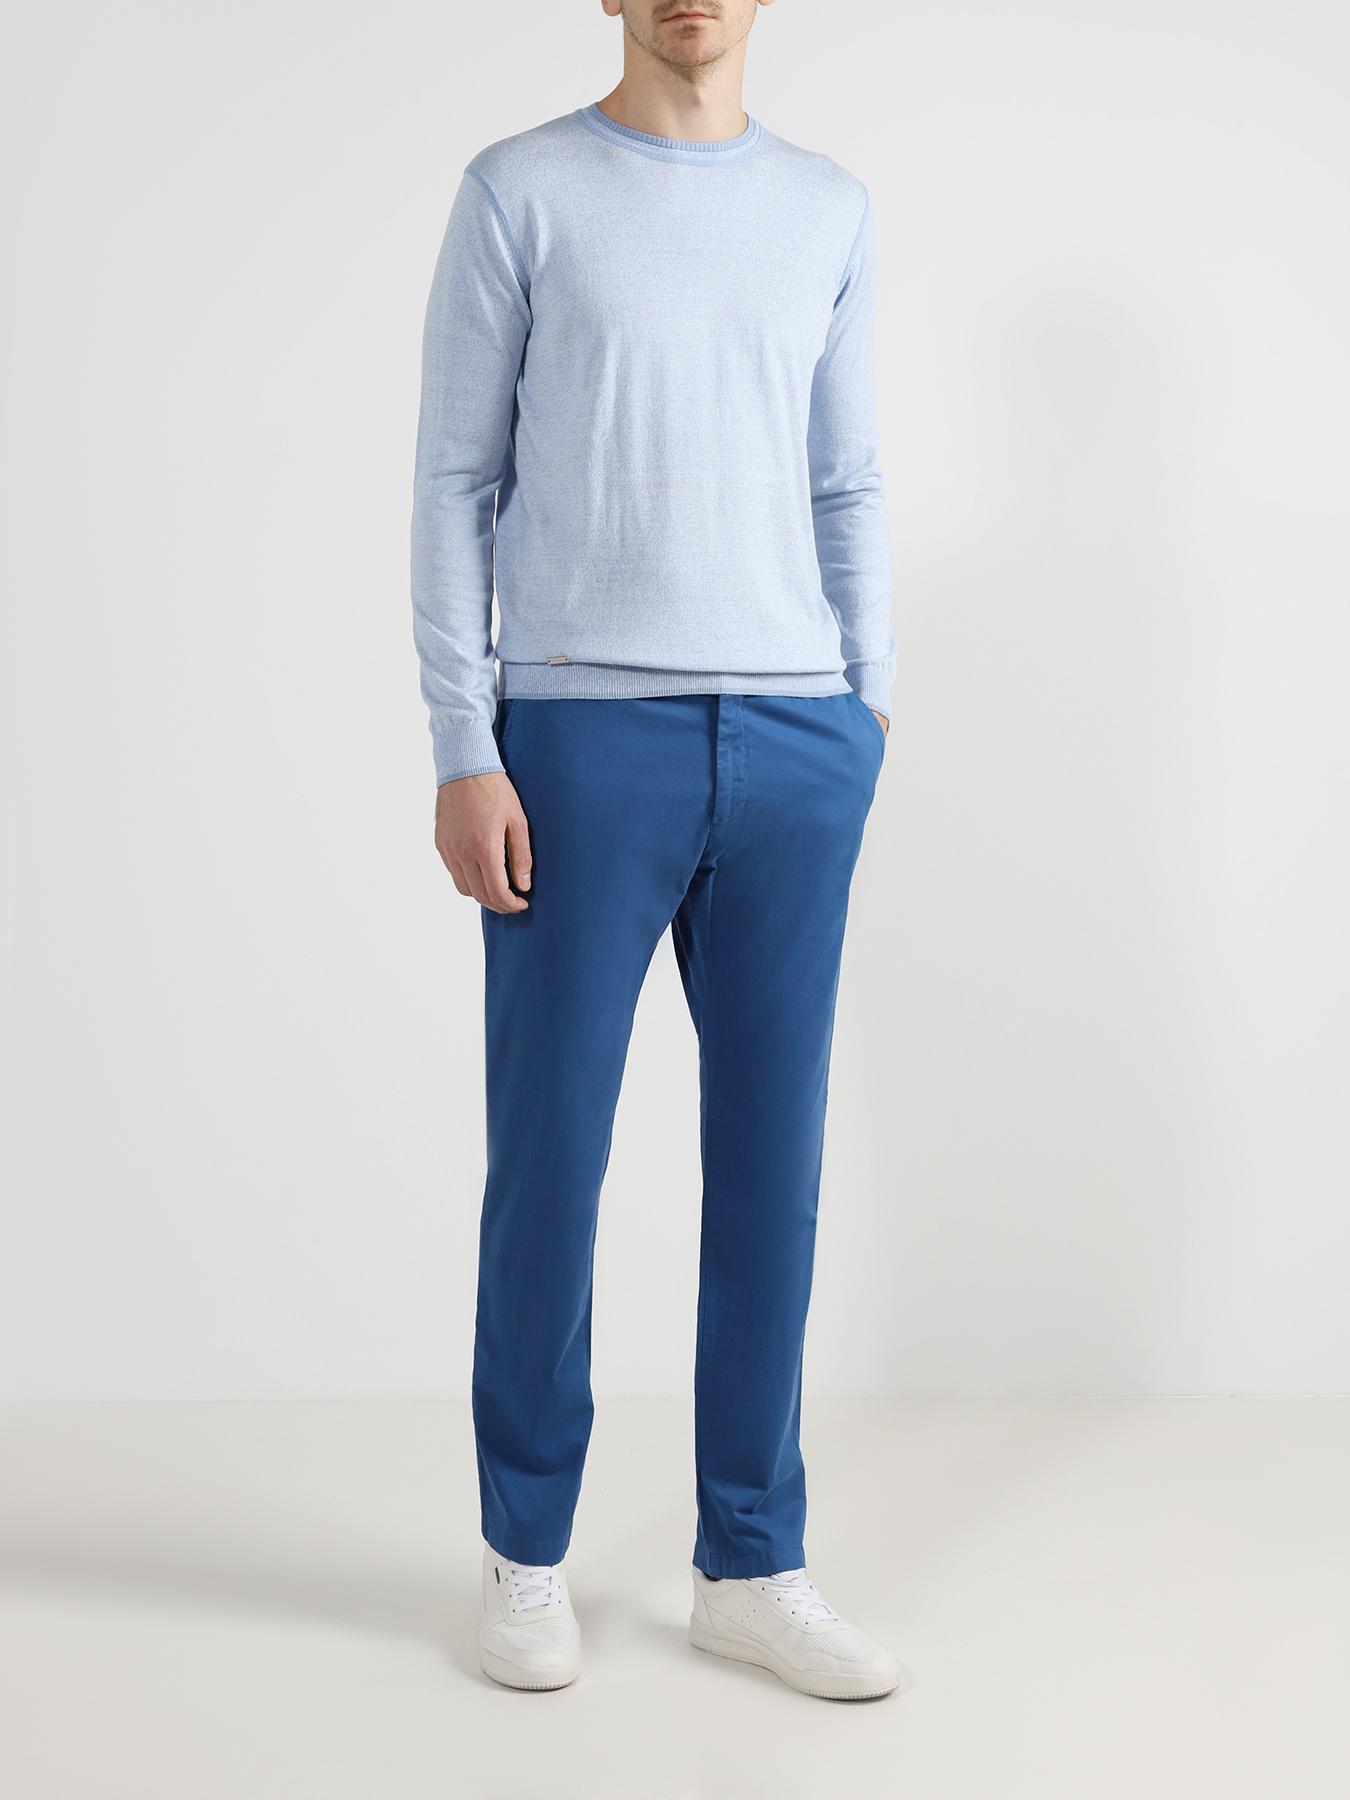 цена на Брюки Strellson Зауженные брюки